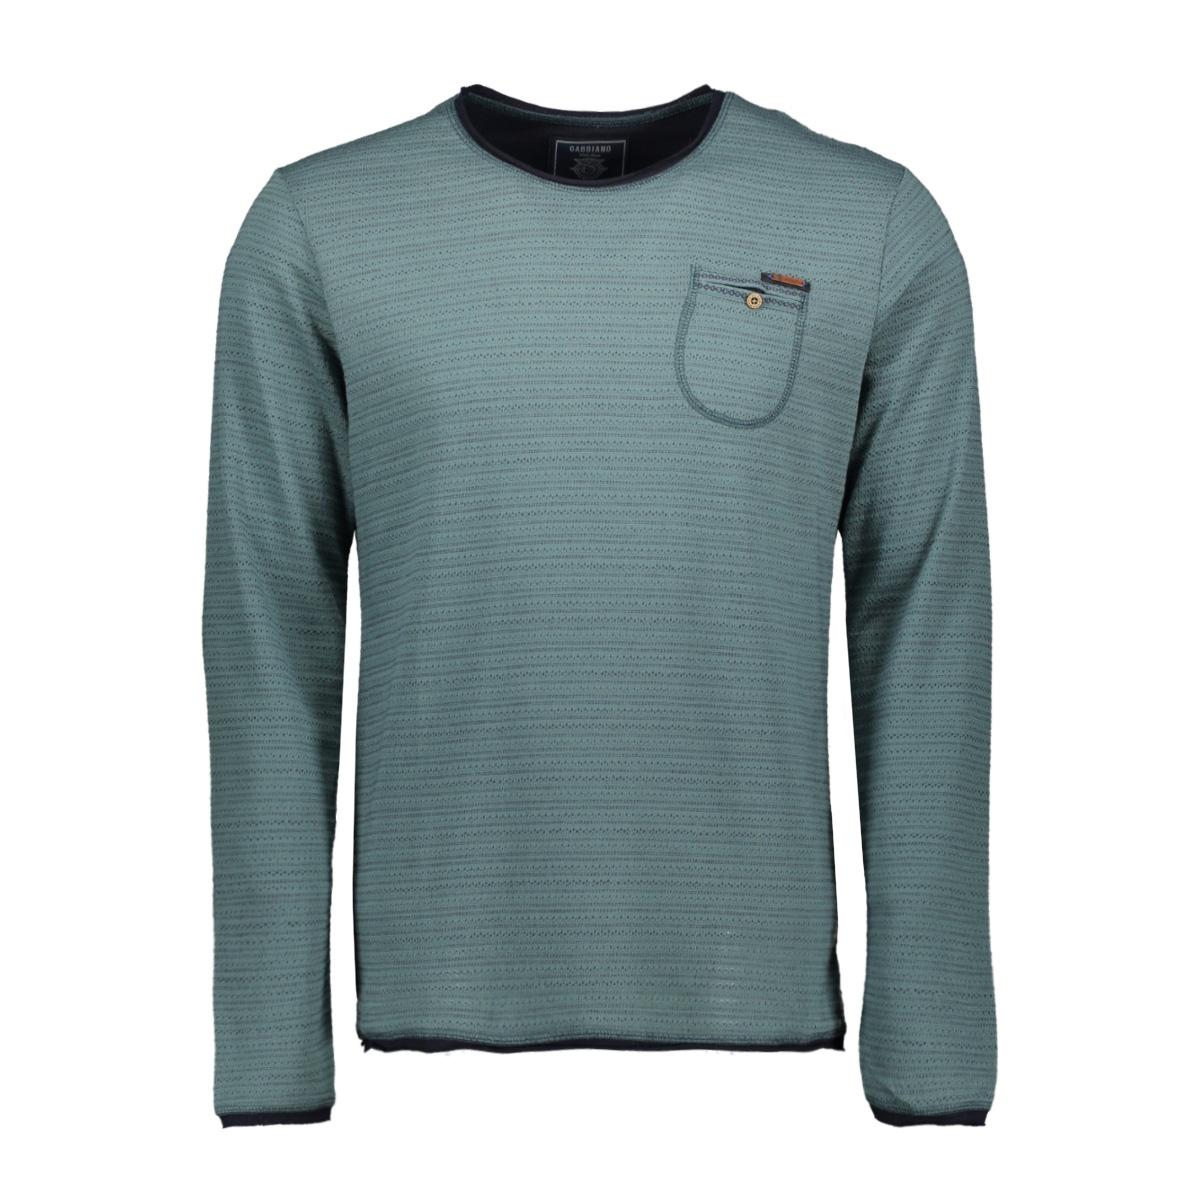 longsleeve 15162 gabbiano t-shirt green